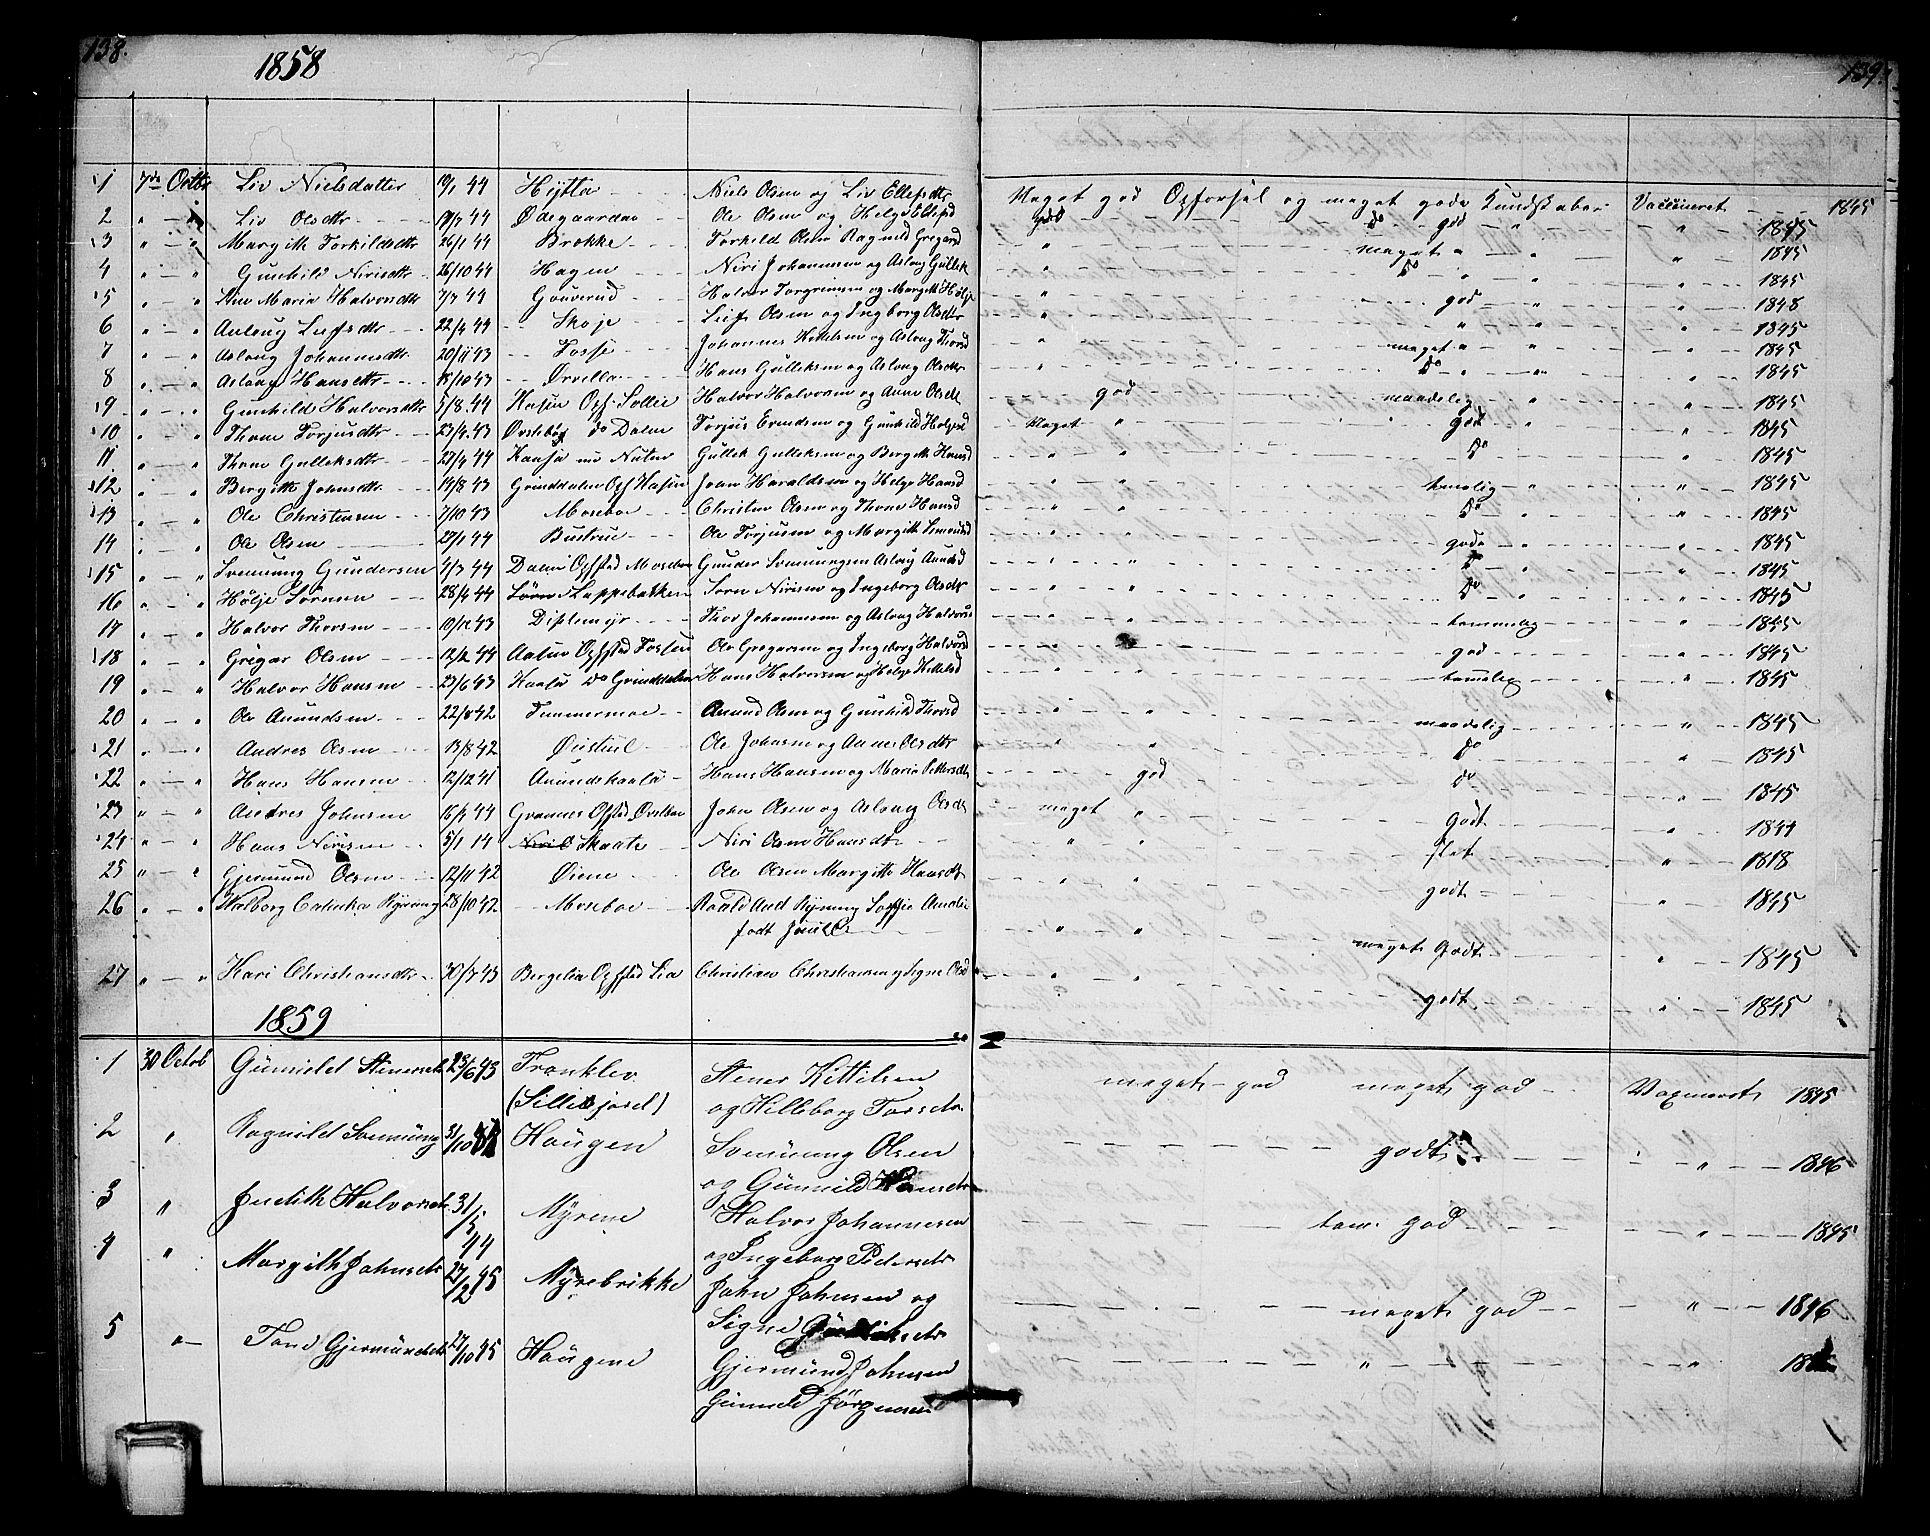 SAKO, Hjartdal kirkebøker, G/Gb/L0002: Klokkerbok nr. II 2, 1854-1884, s. 138-139